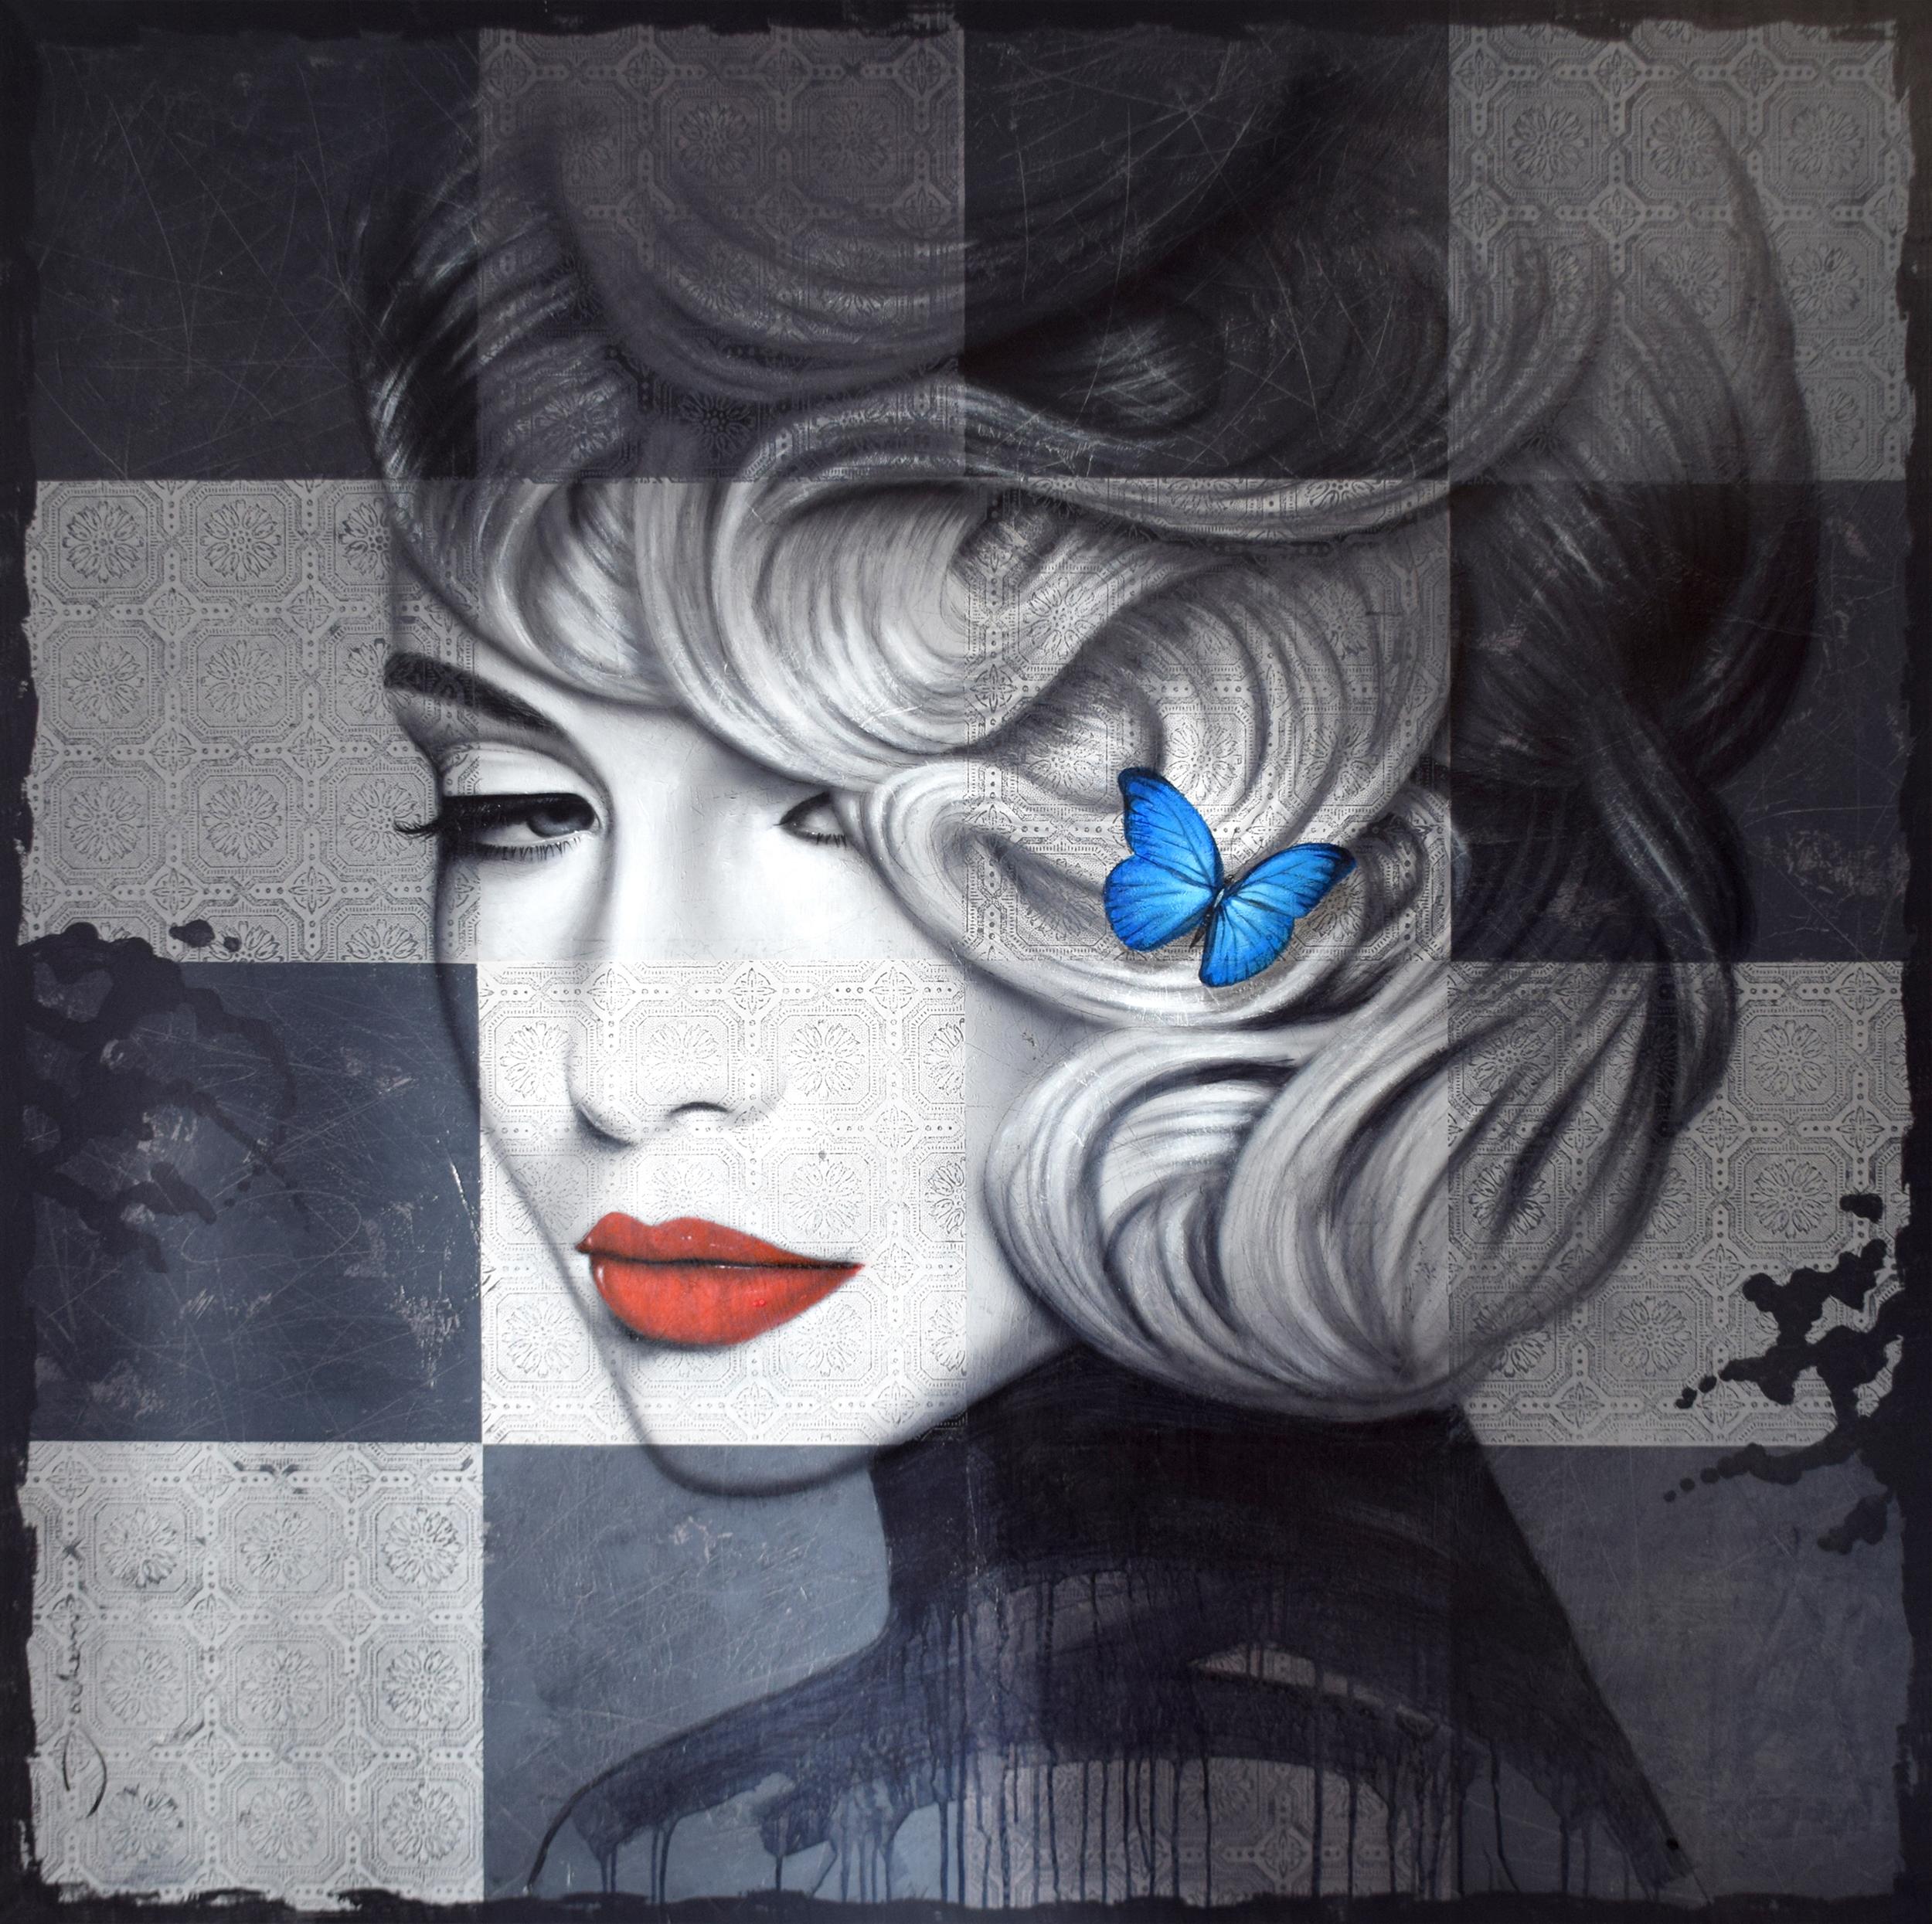 Hans Jochem Bakker - Blue Butterfly , 0657-012-005